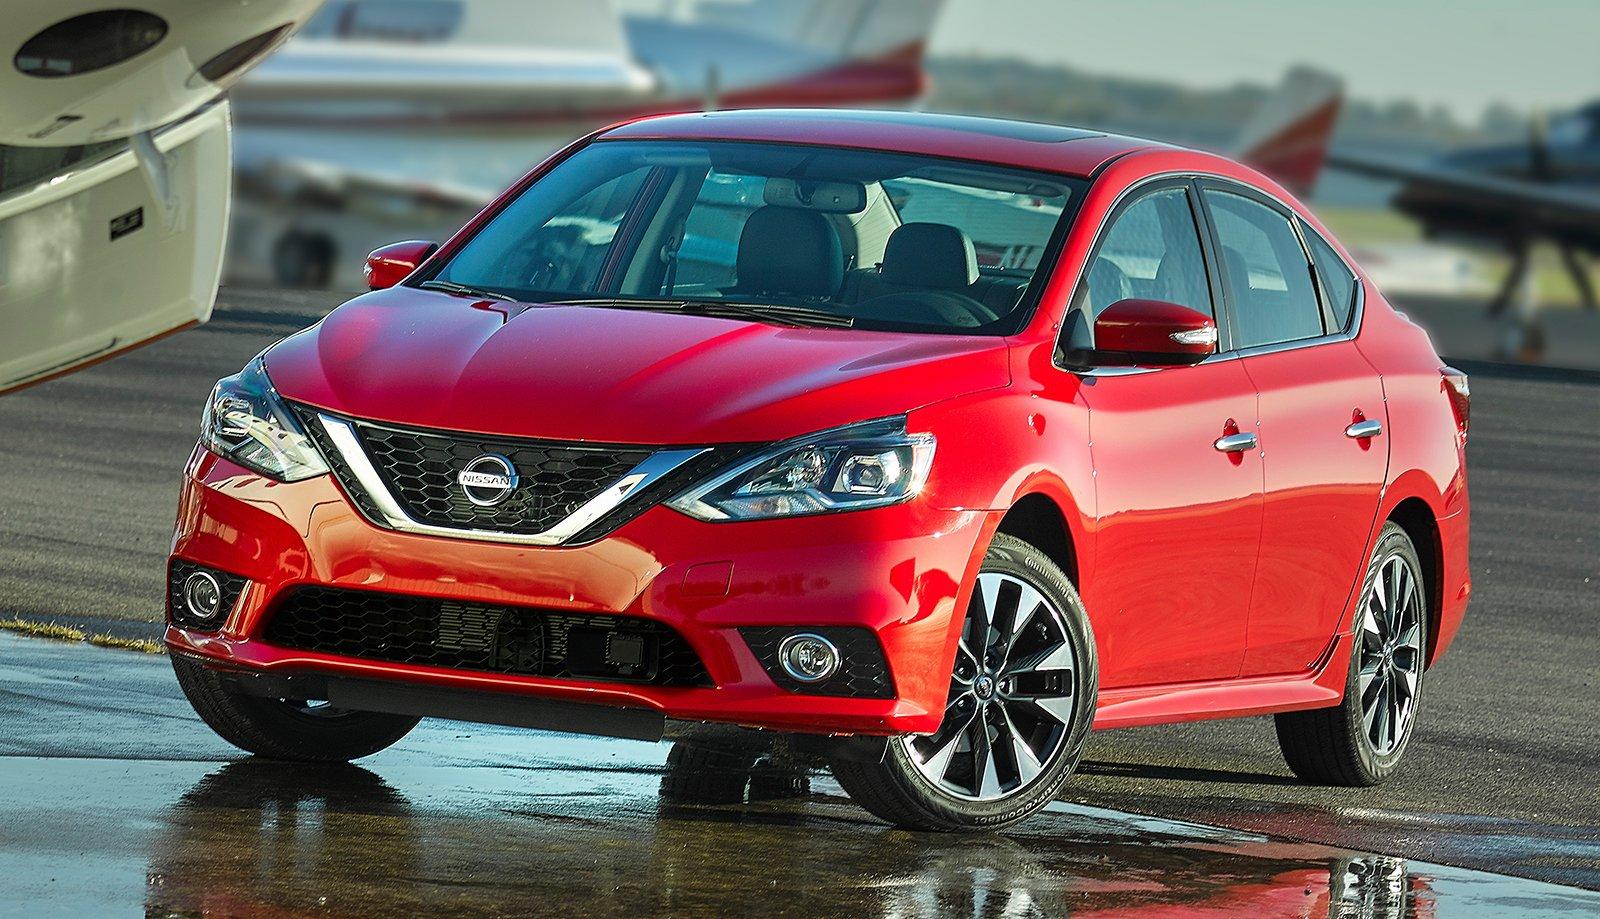 Nissan Sentra 2018 >> LA 2015: 2016 Nissan Sentra – Sylphy V-motion facelift Paul Tan - Image 409738